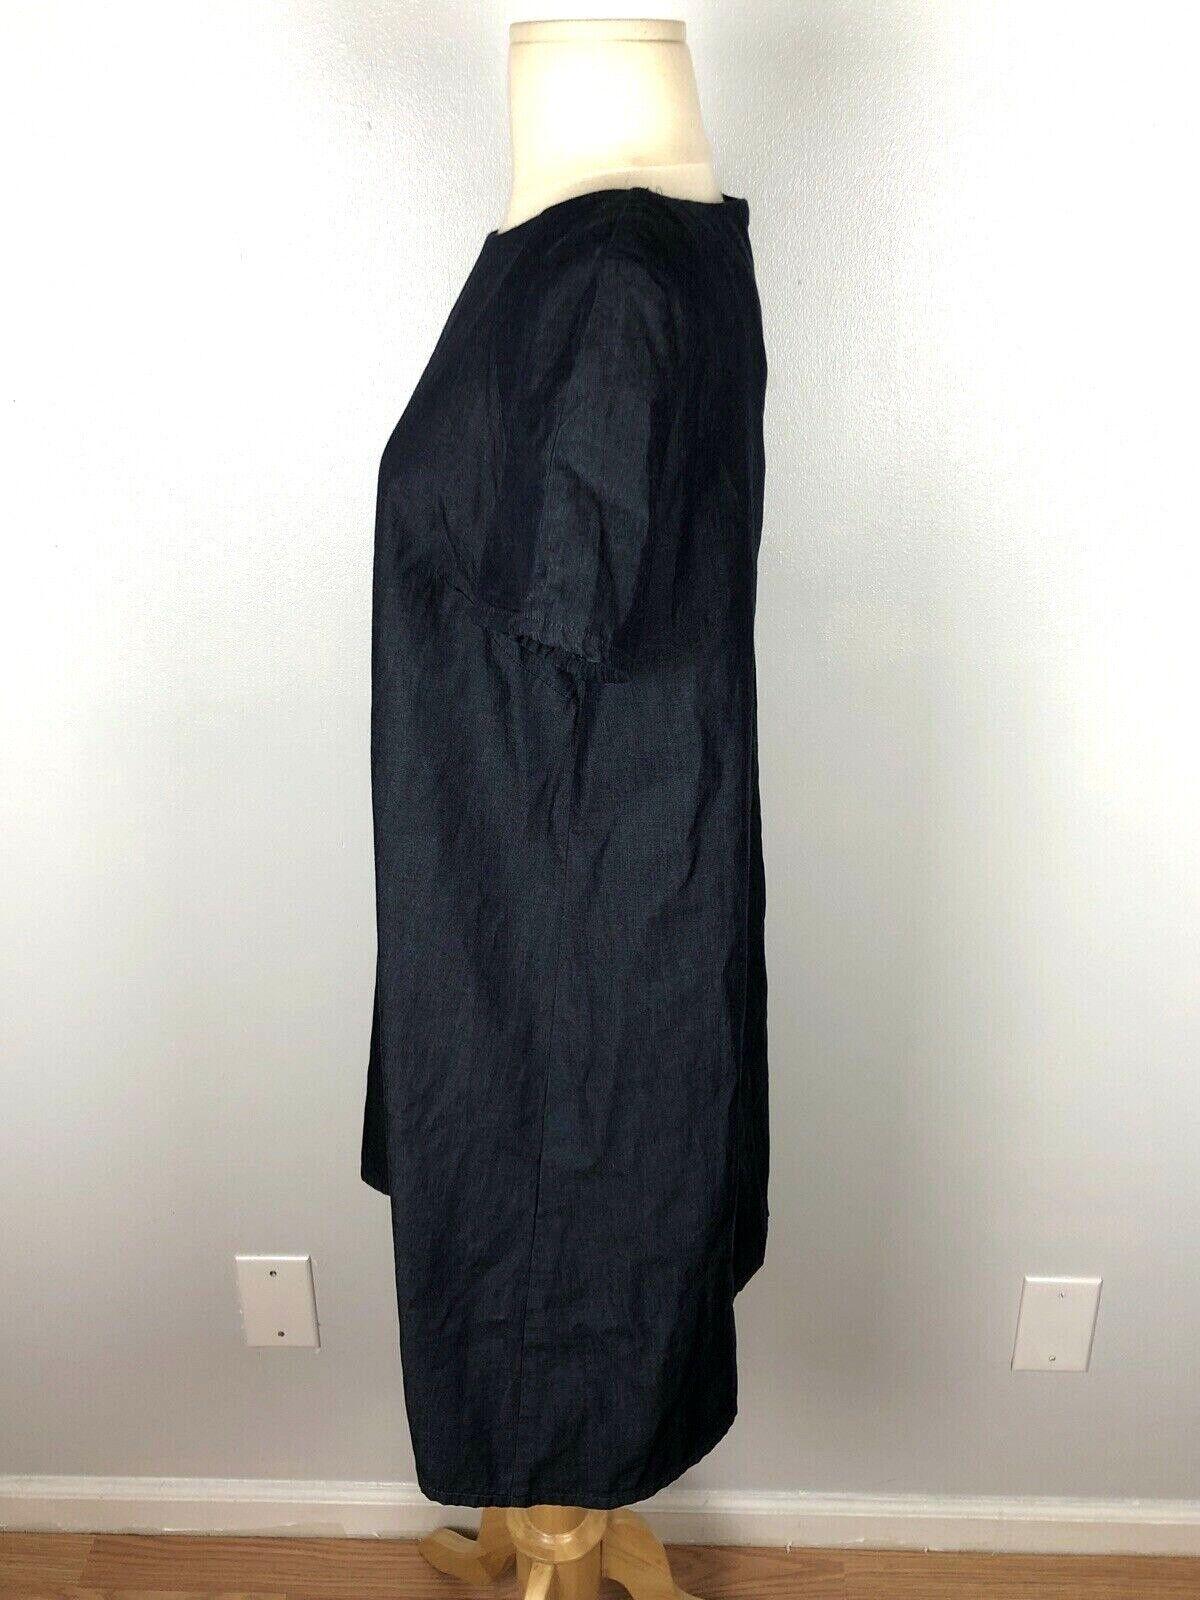 Zara Basic Denim Dark Wash Swing Dress, Size L - image 4